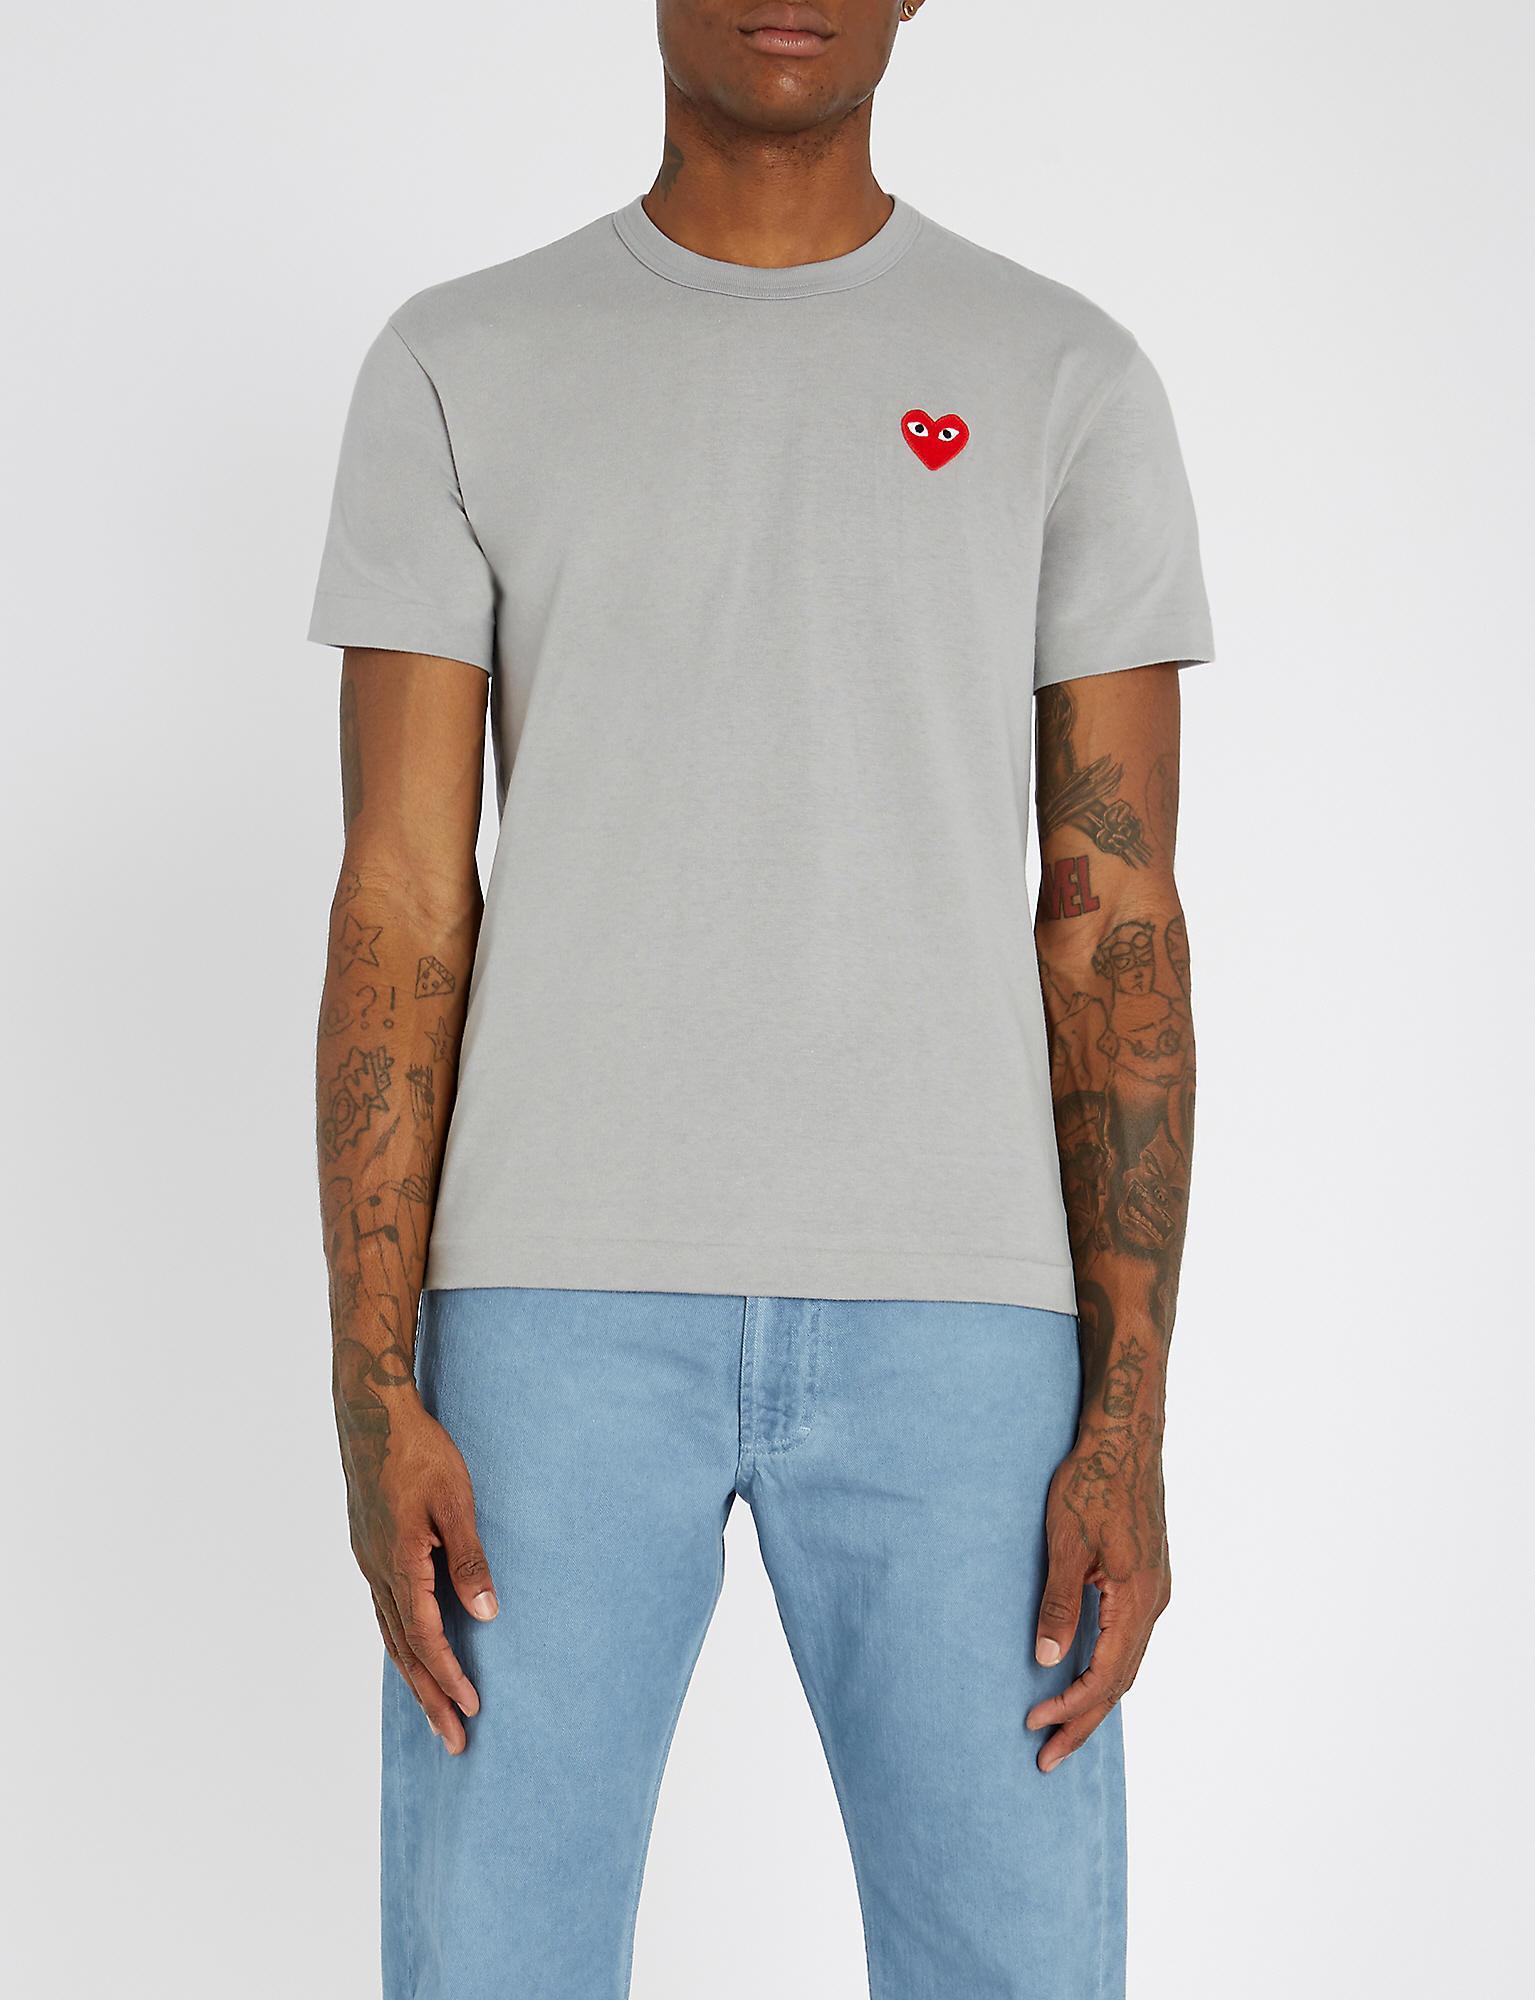 5a6e4bf8447 COMME DES GARÇONS PLAY Heart-appliqué Cotton-jersey T-shirt in Gray ...